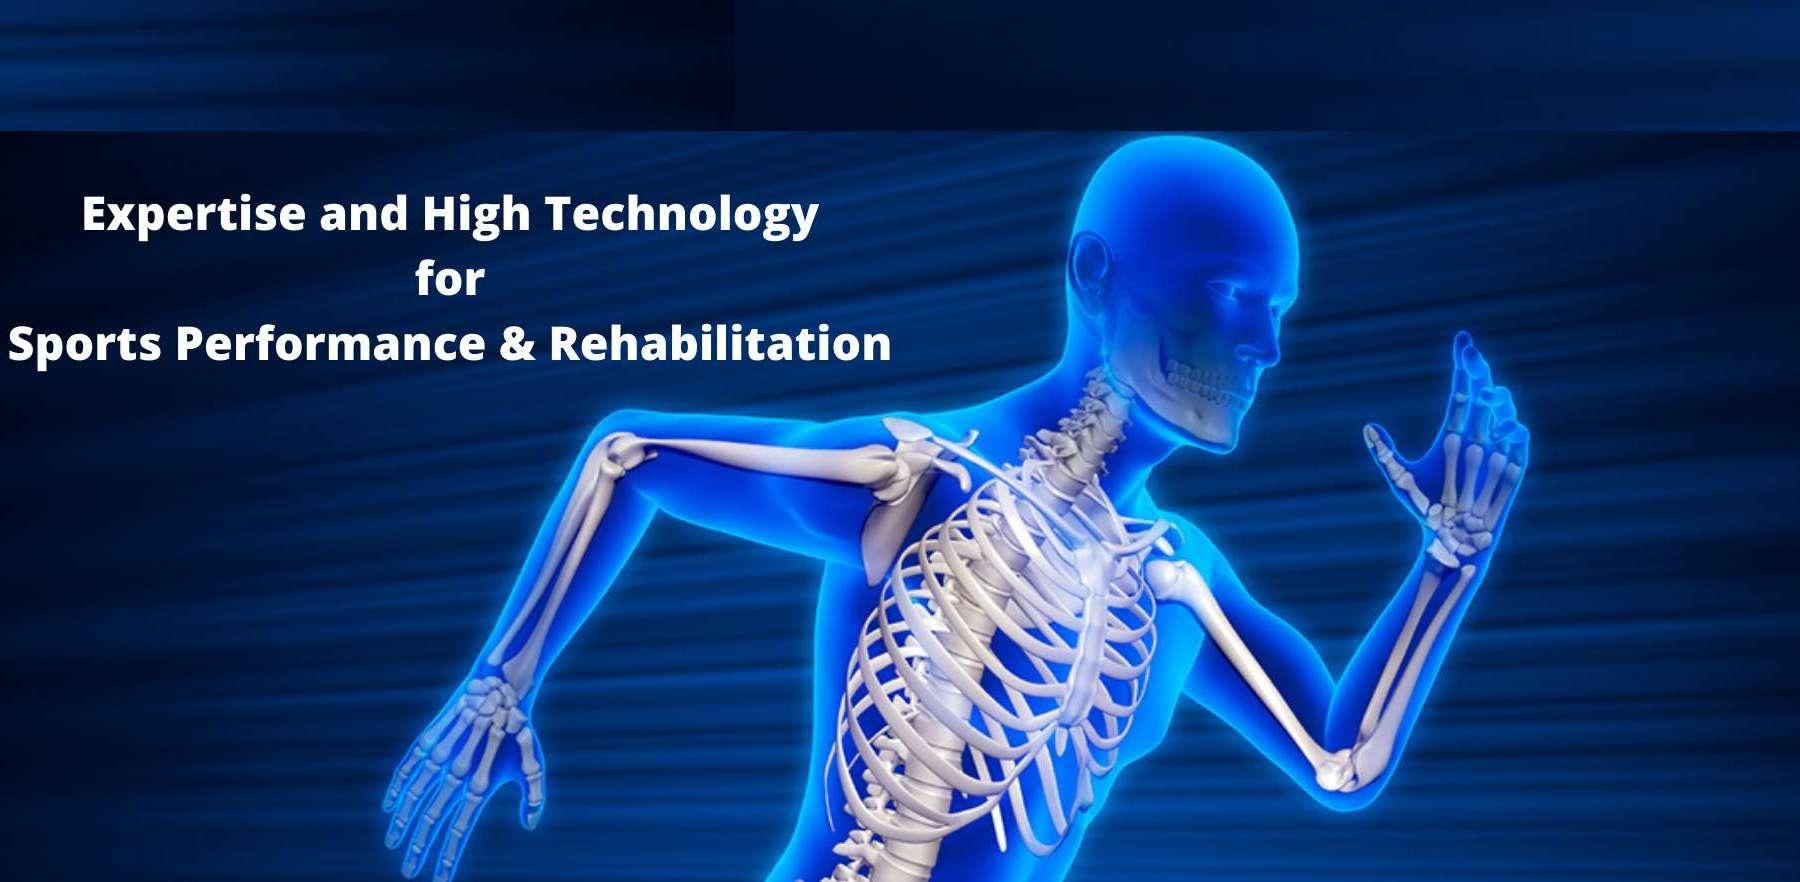 Sports Therapy, Gait Analysis & Massage Therapy